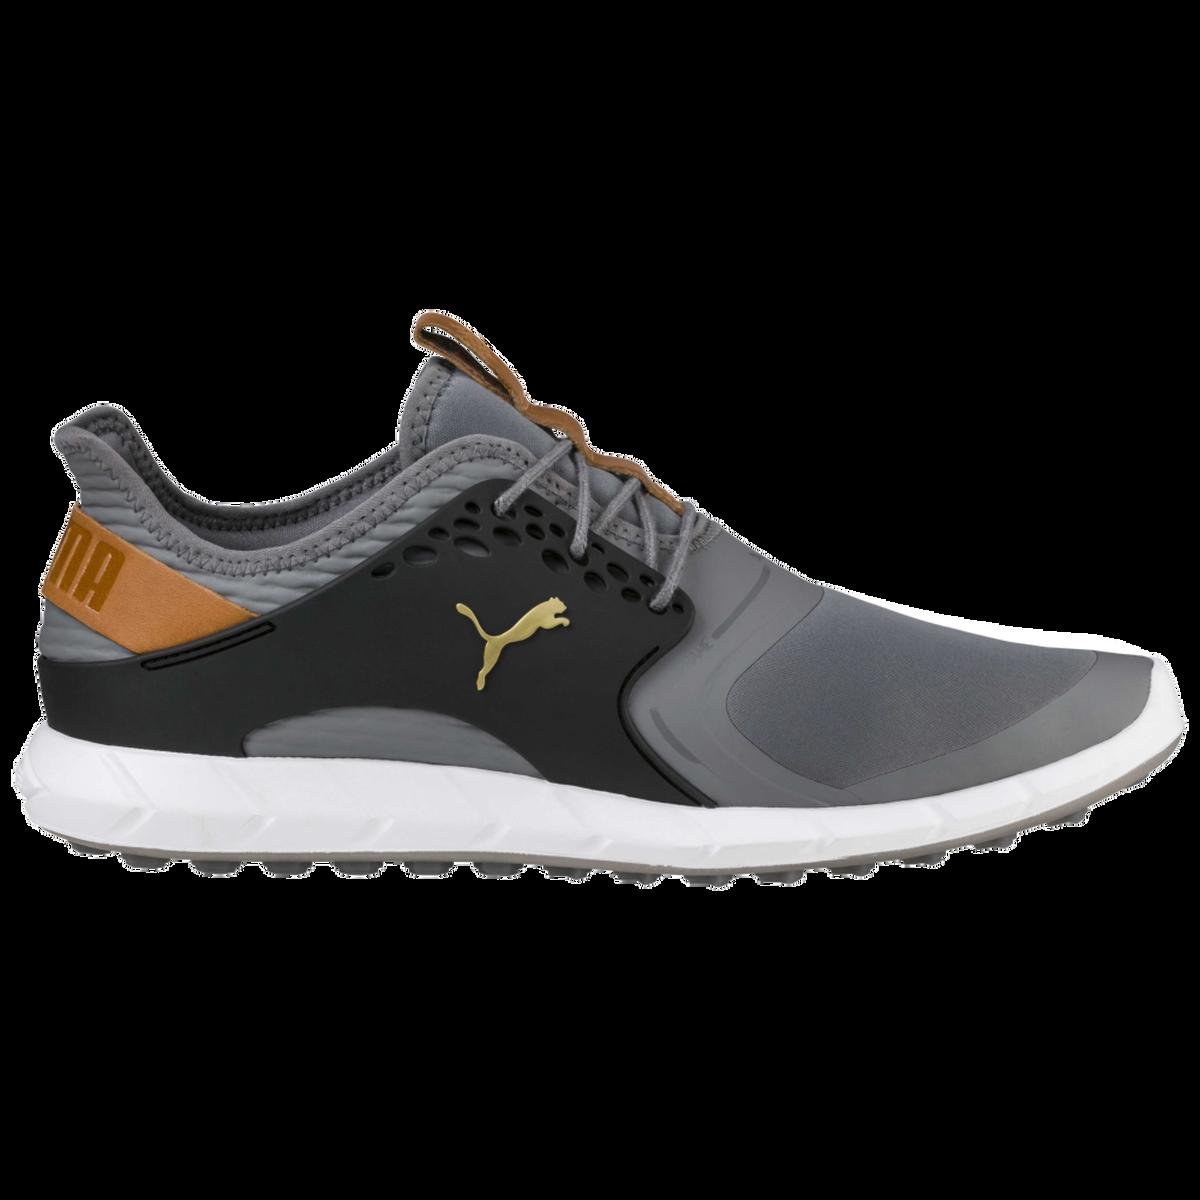 b8541885 PUMA IGNITE PWRSPORT Men's Golf Shoe - Grey/Black